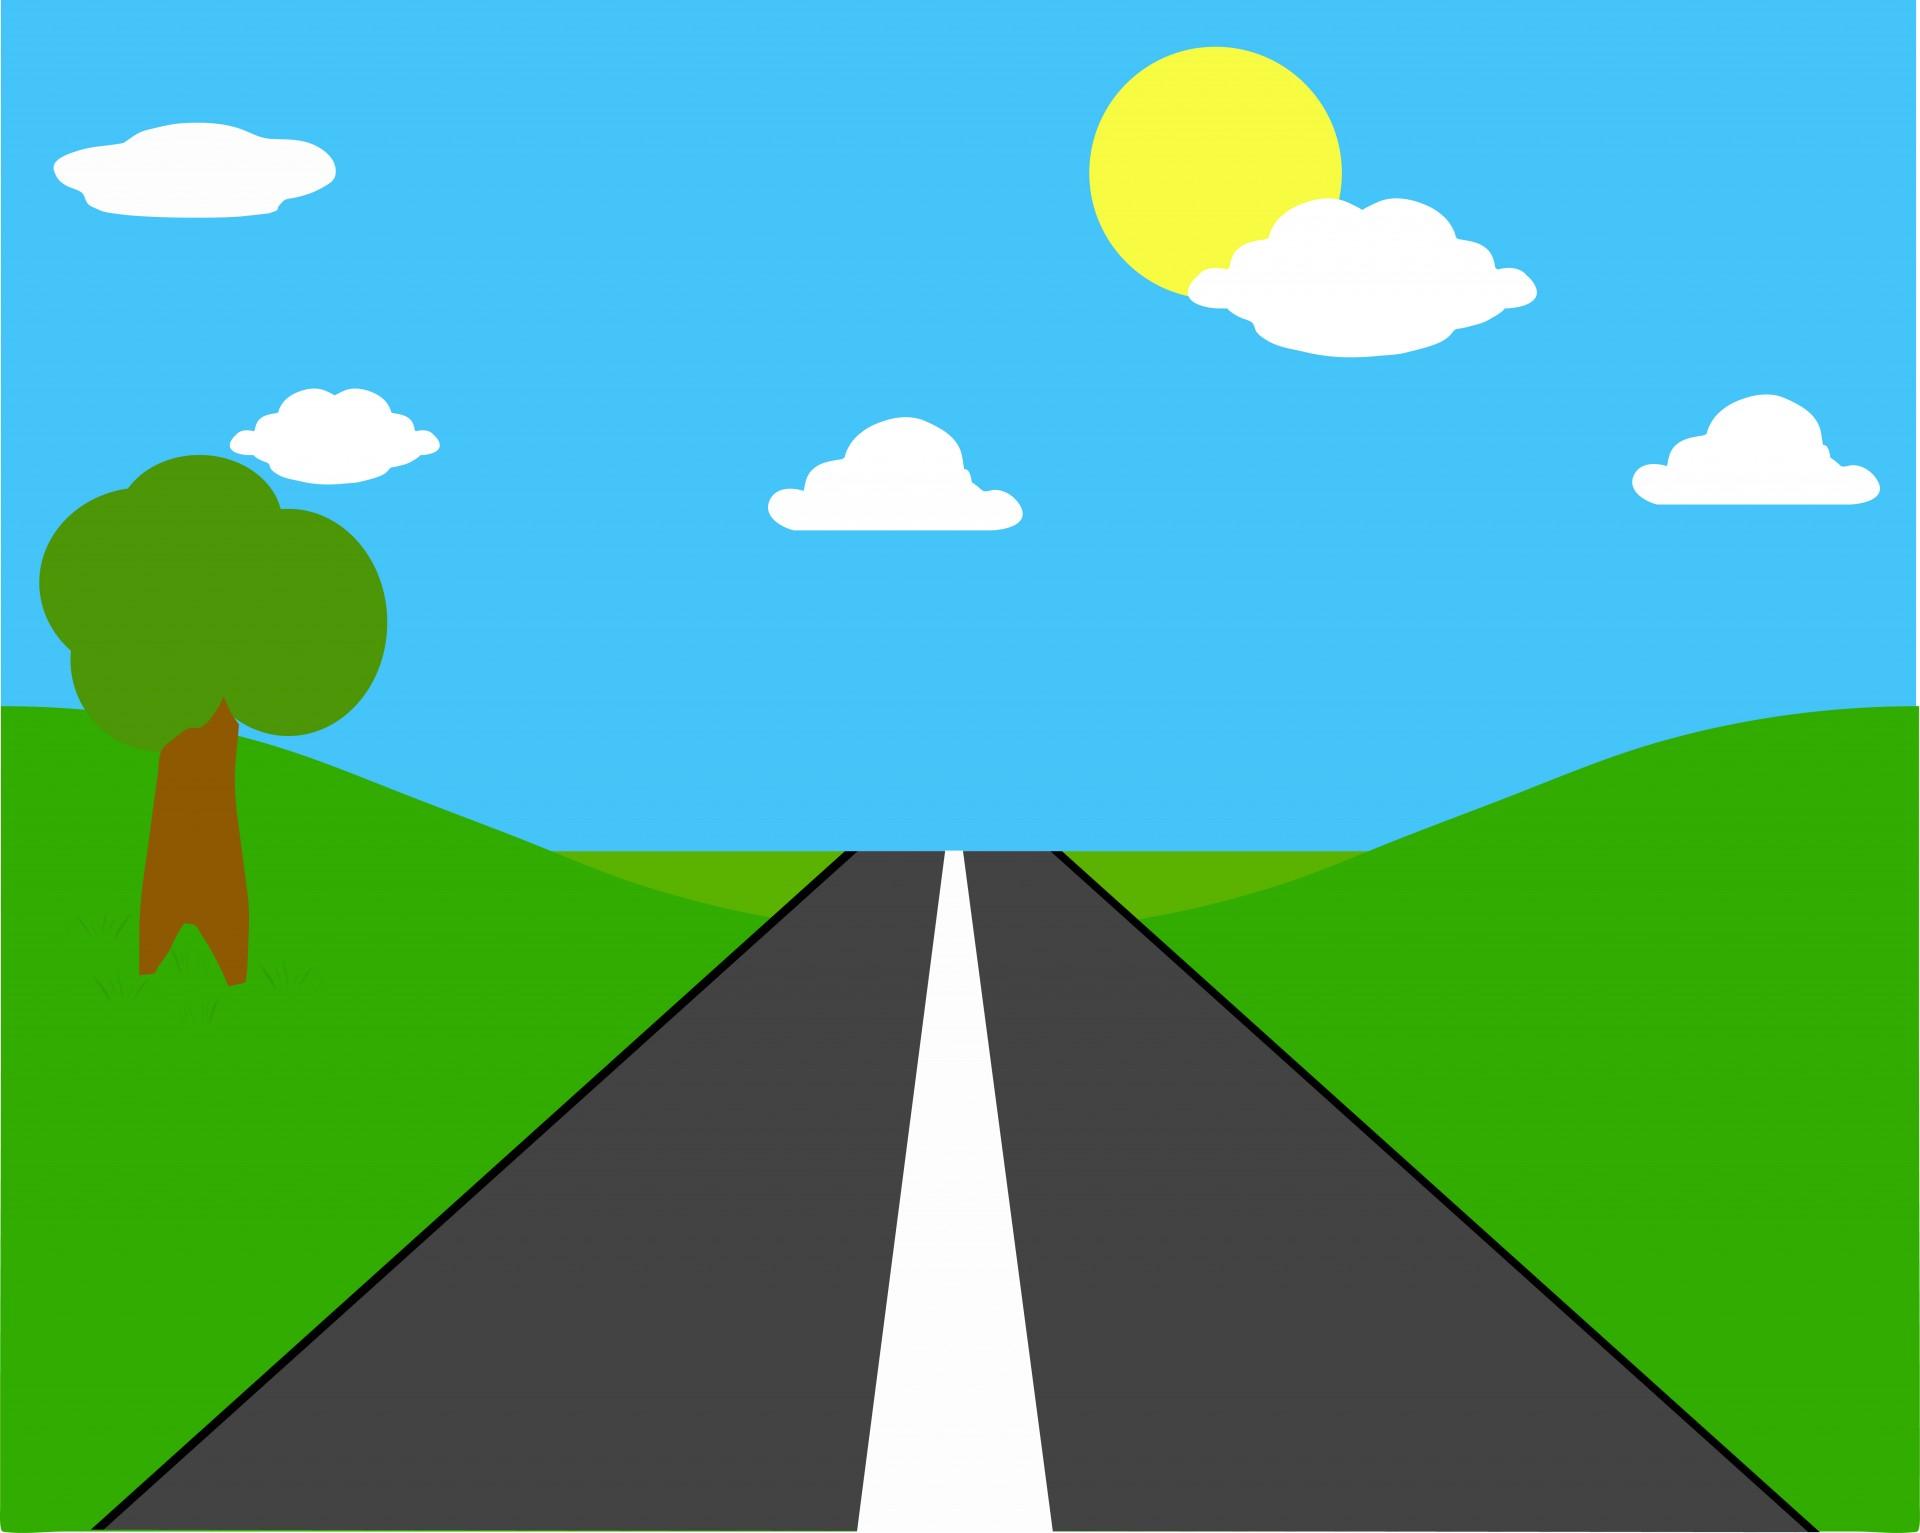 Open road throughuntryside free stock photo public domain.